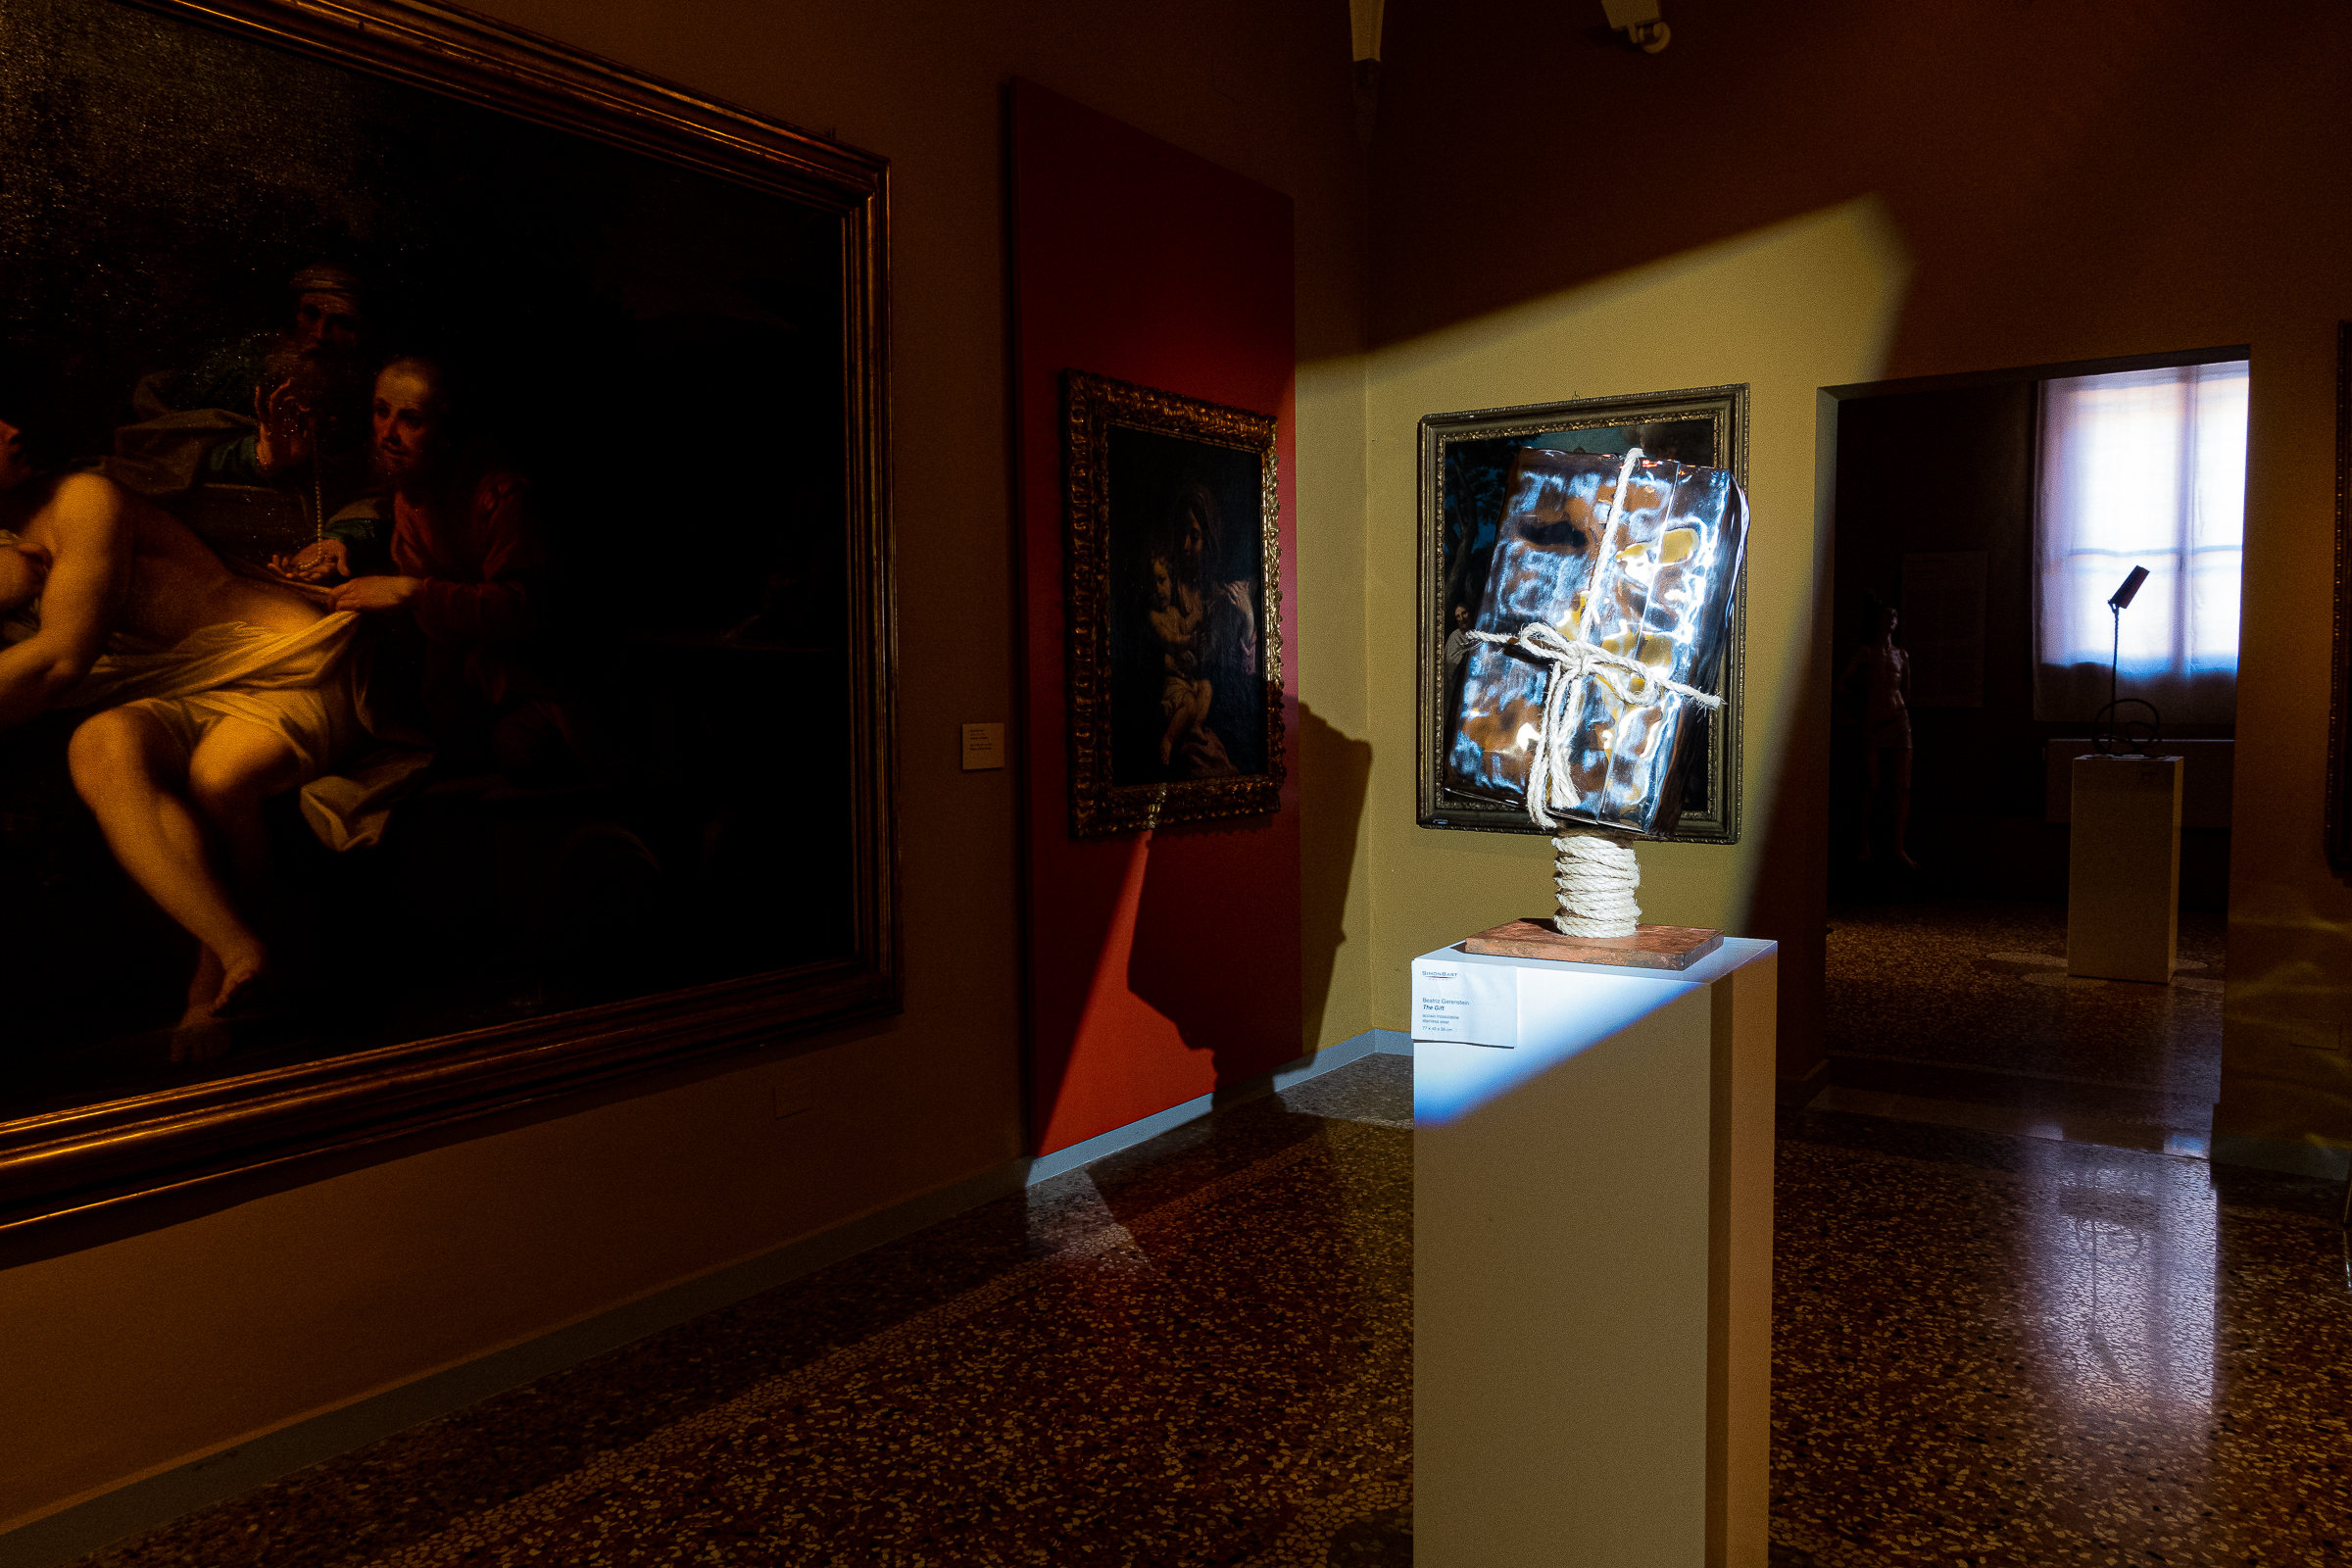 The-Gift-museum-la-quadreria-bologna-Italy-Beatriz-Gerenstein-1